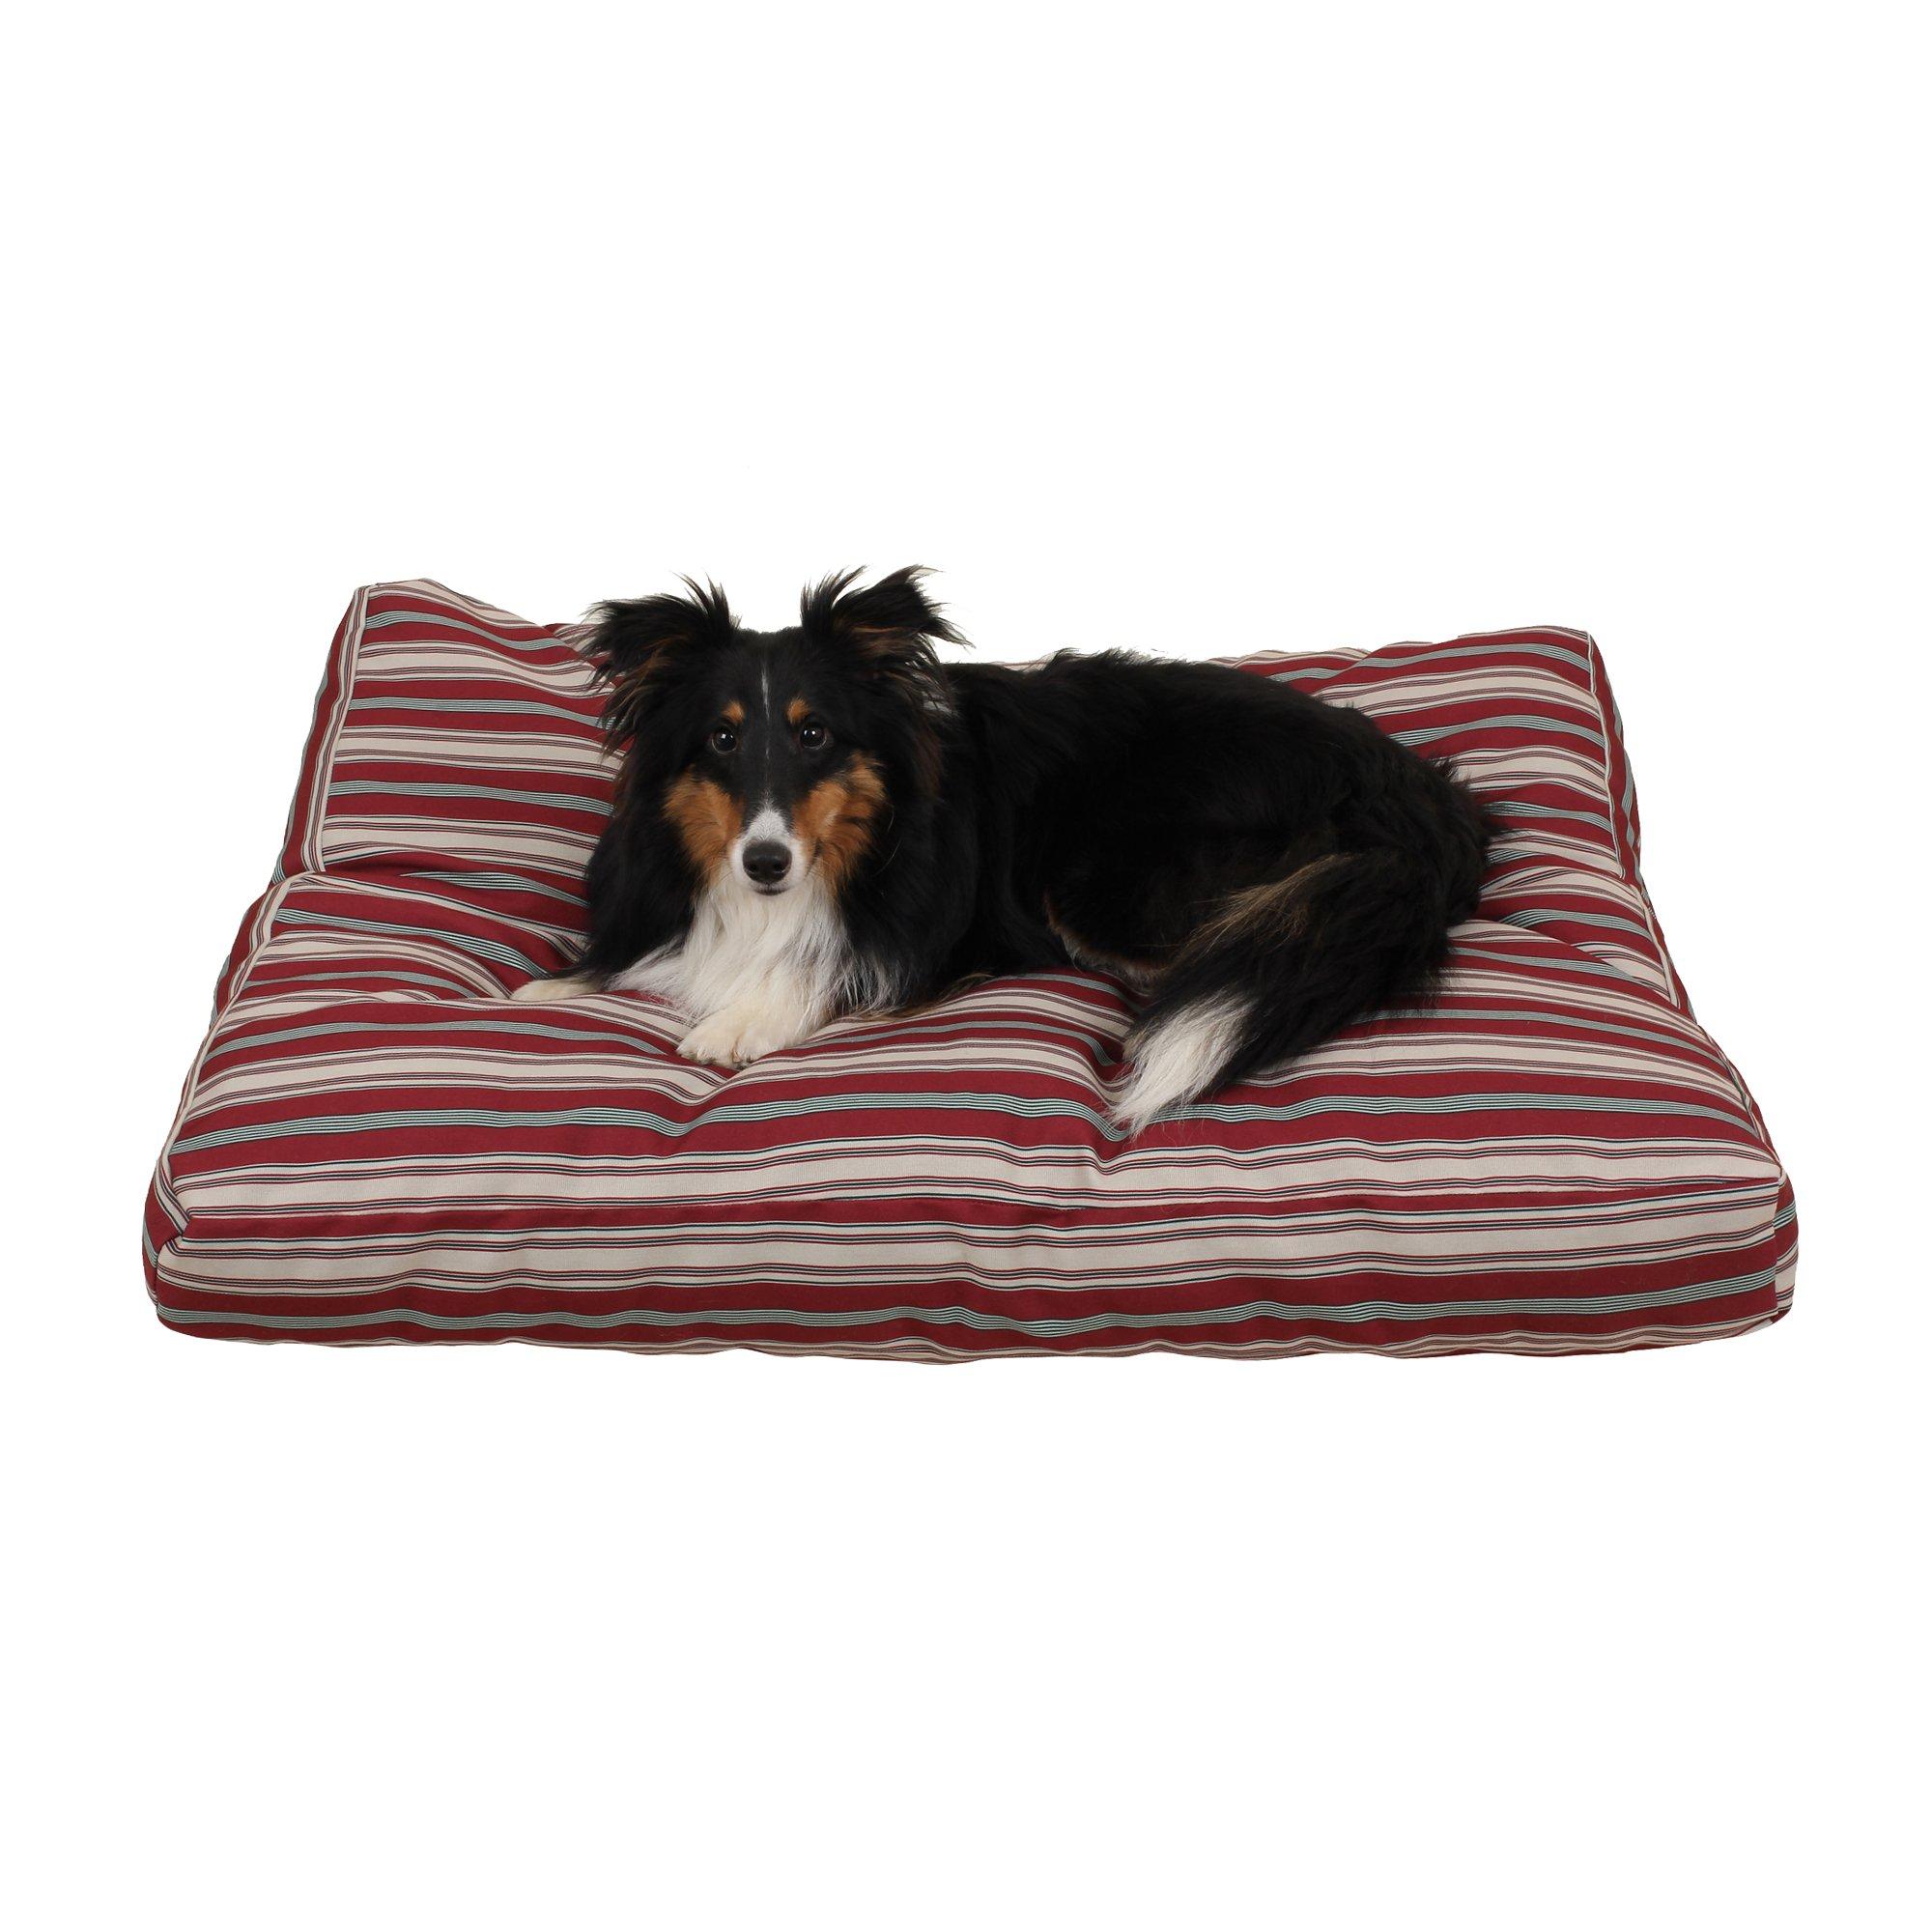 Carolina Pet Company Indoor Outdoor Jamison Red Striped Dog Bed